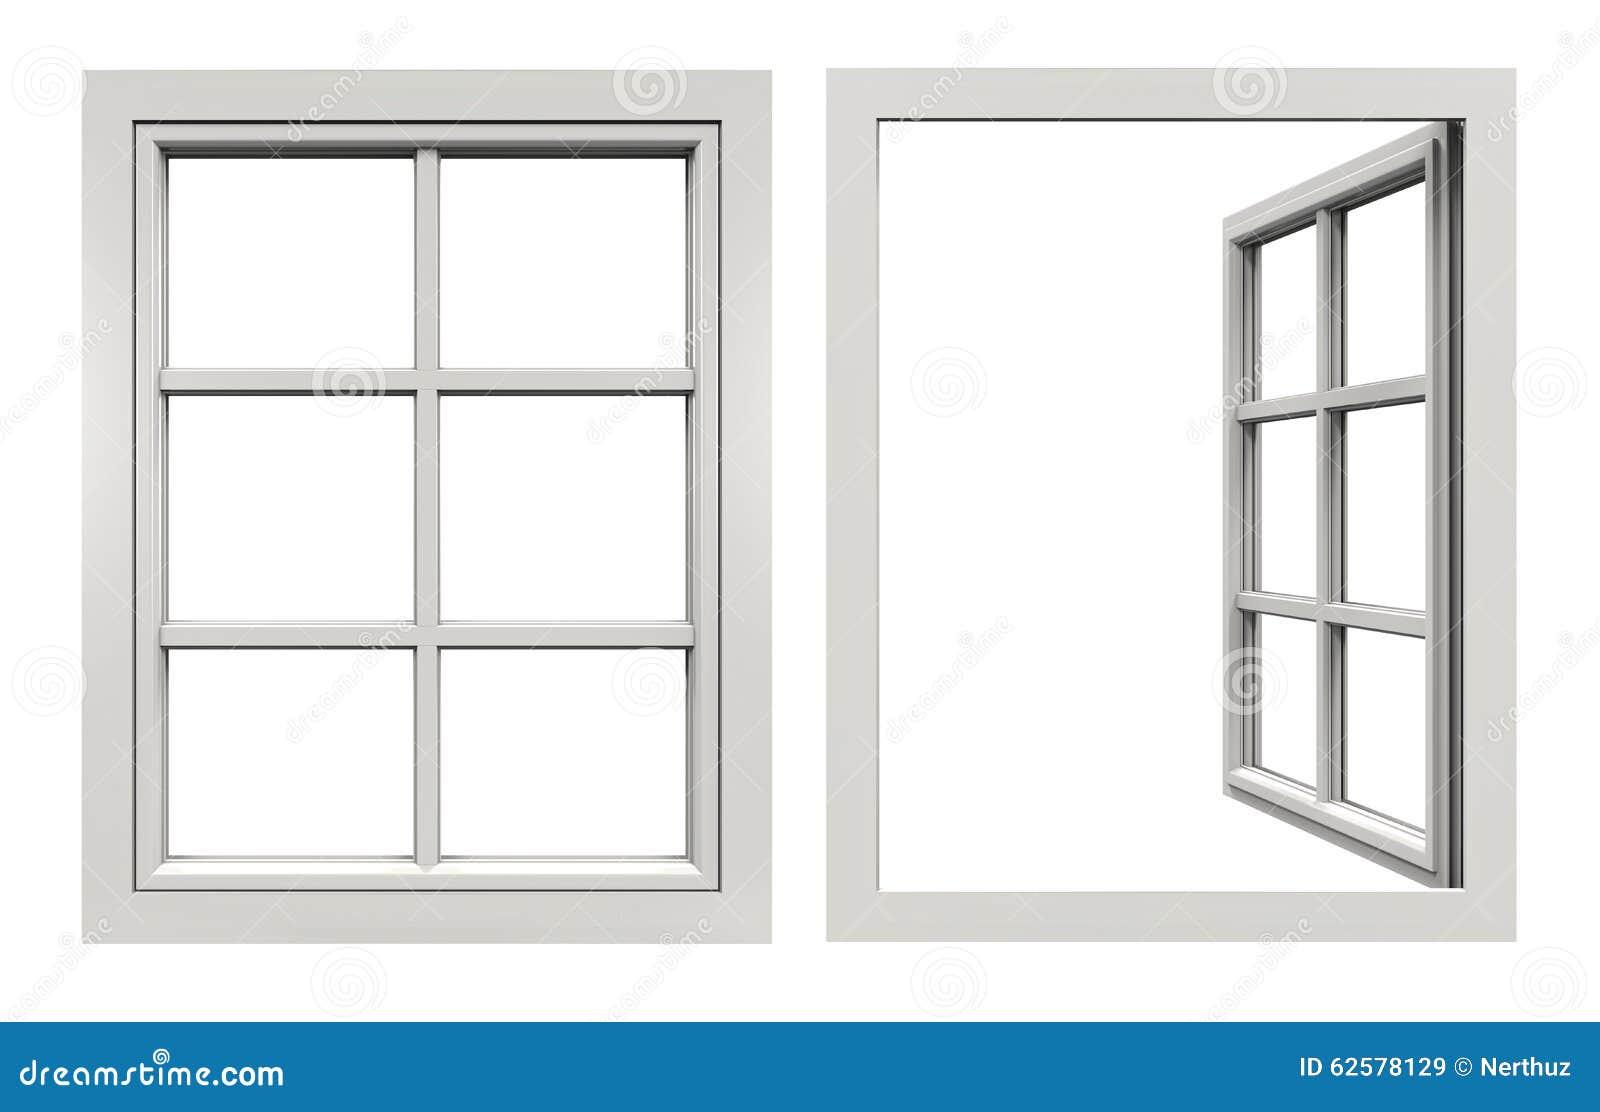 offenes fenster gezeichnet. Black Bedroom Furniture Sets. Home Design Ideas